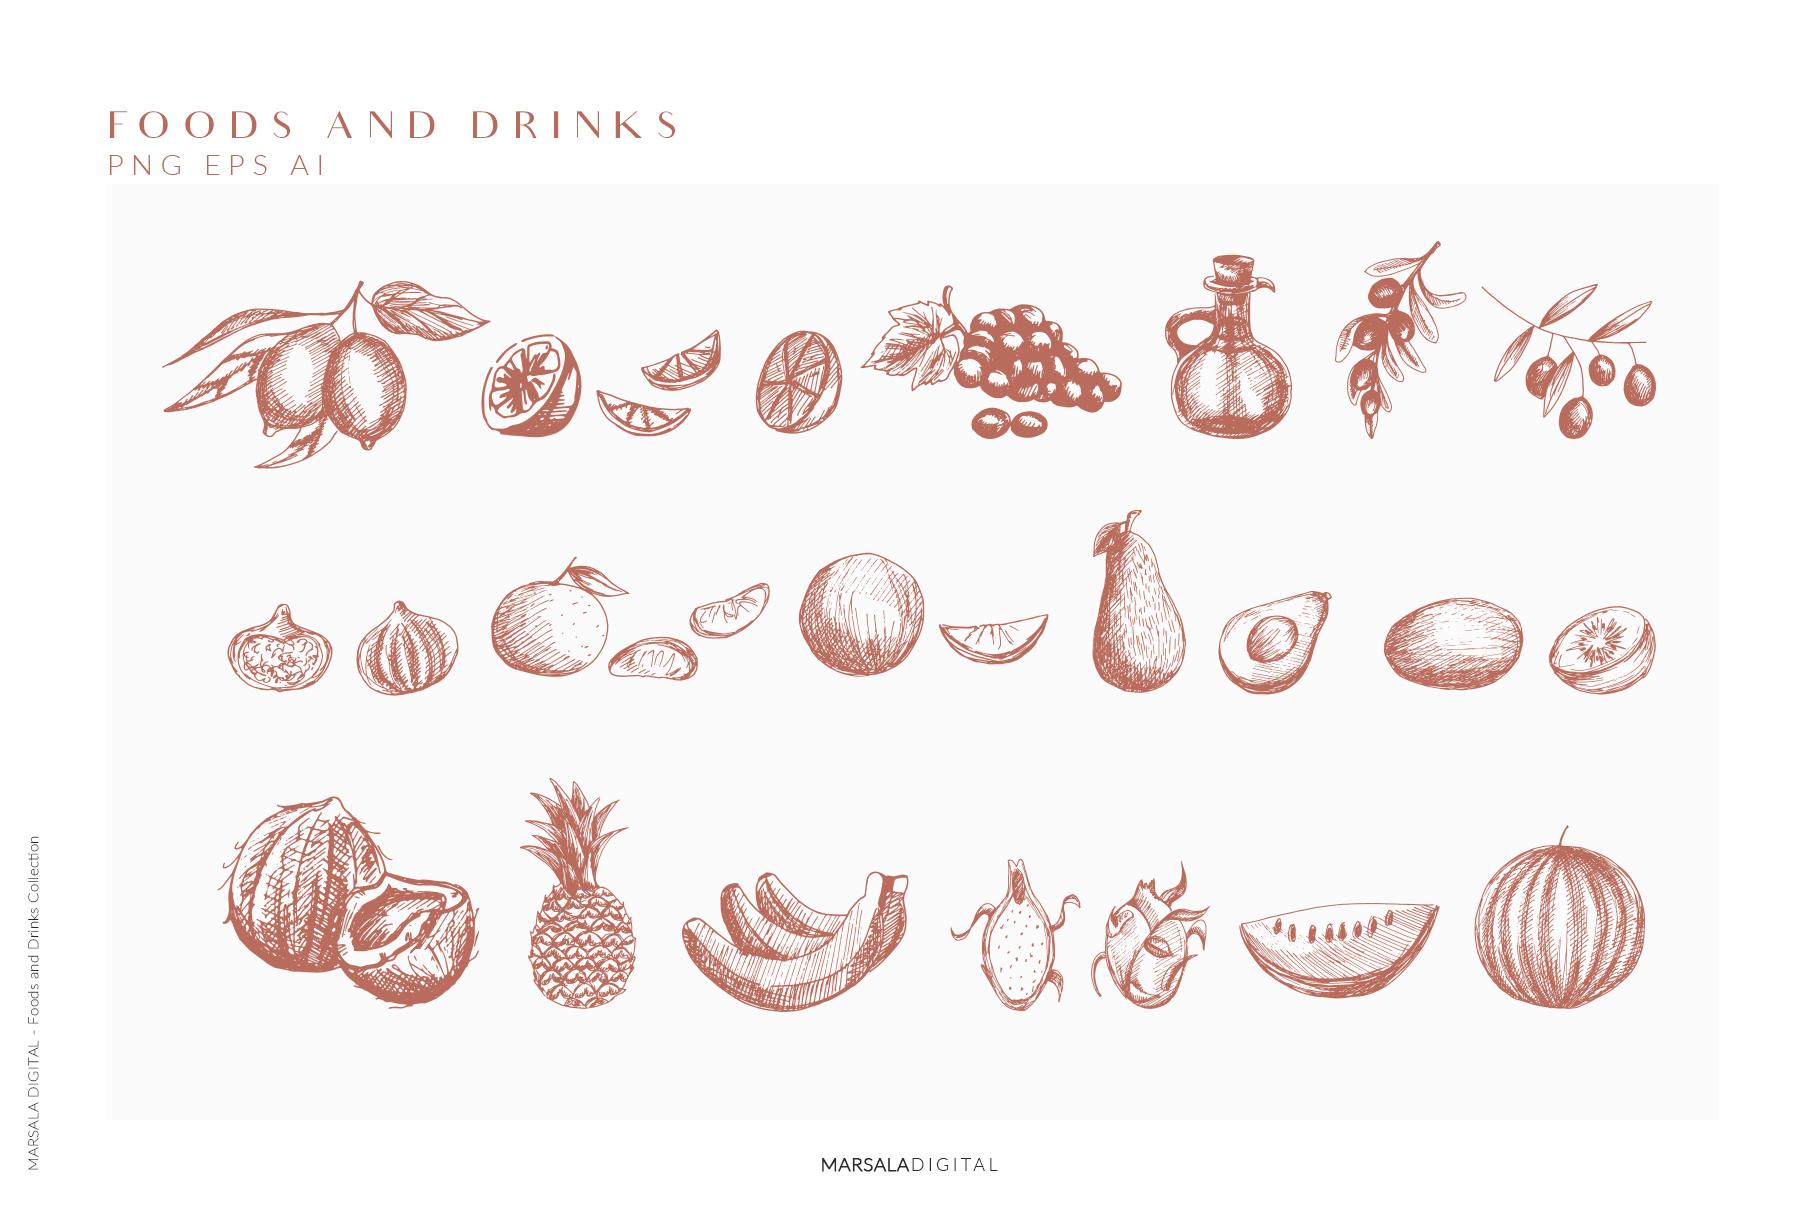 Foods & Drinks Logo Elements Handrawn Graphics example image 8